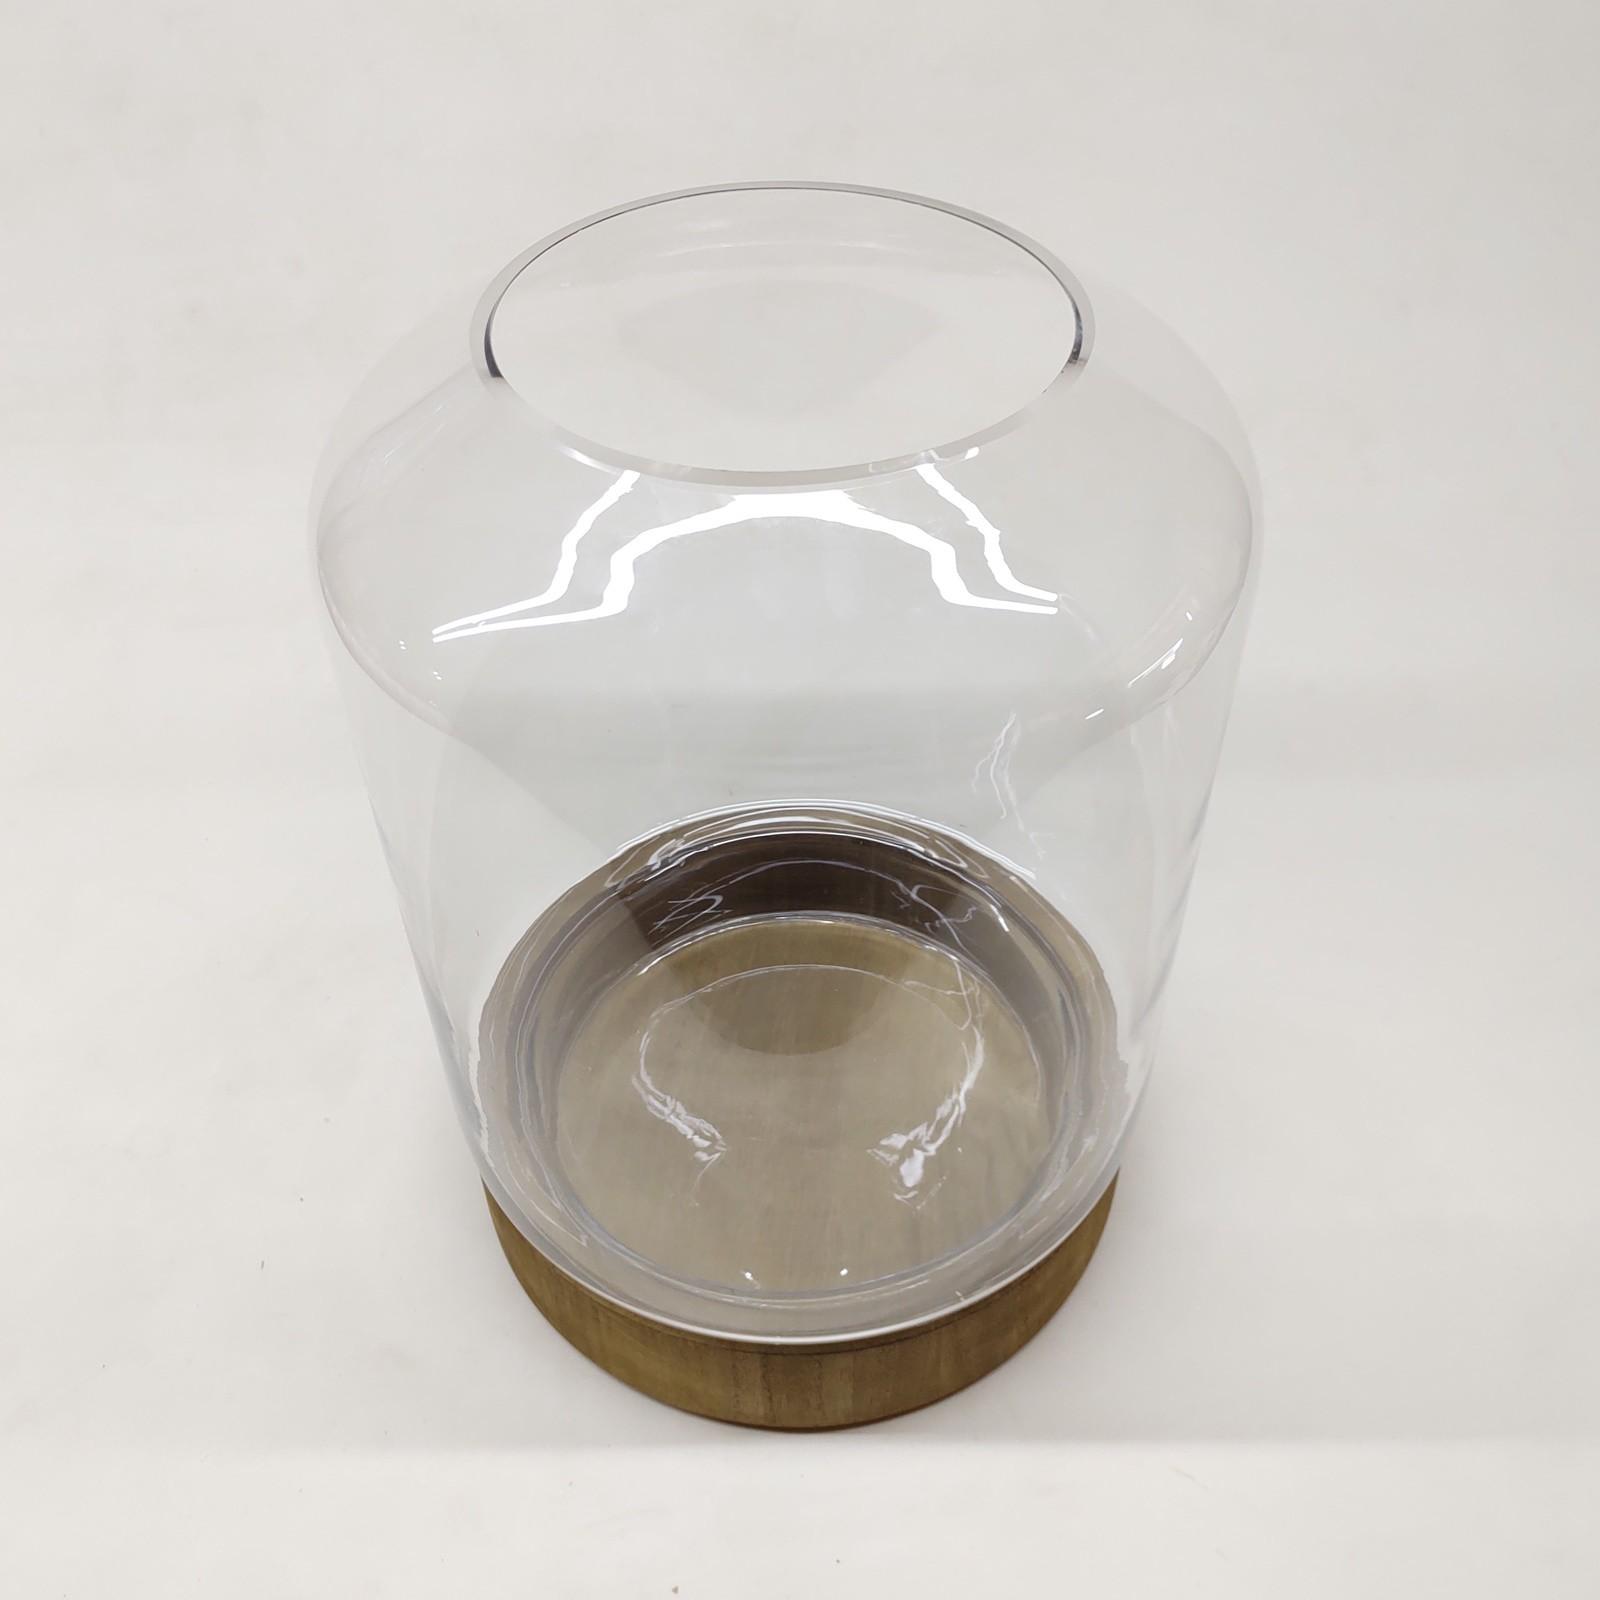 Vaso de Vidro Atla Com Base de Madeira